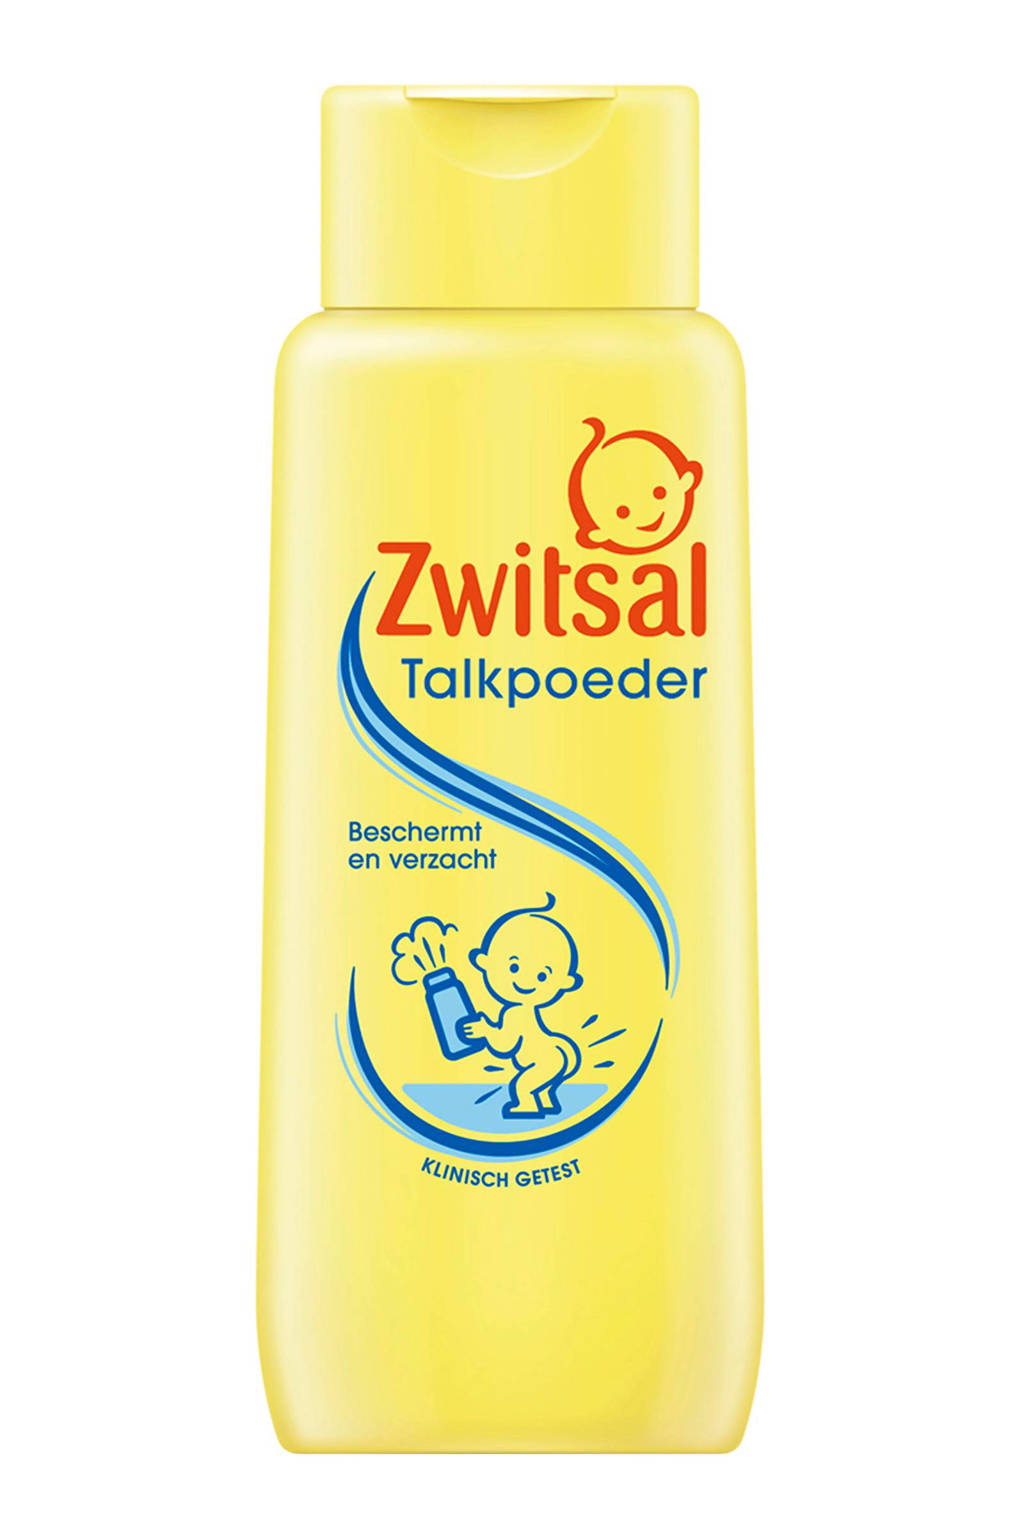 Zwitsal talkpoeder - 100 g - baby, 100 gram